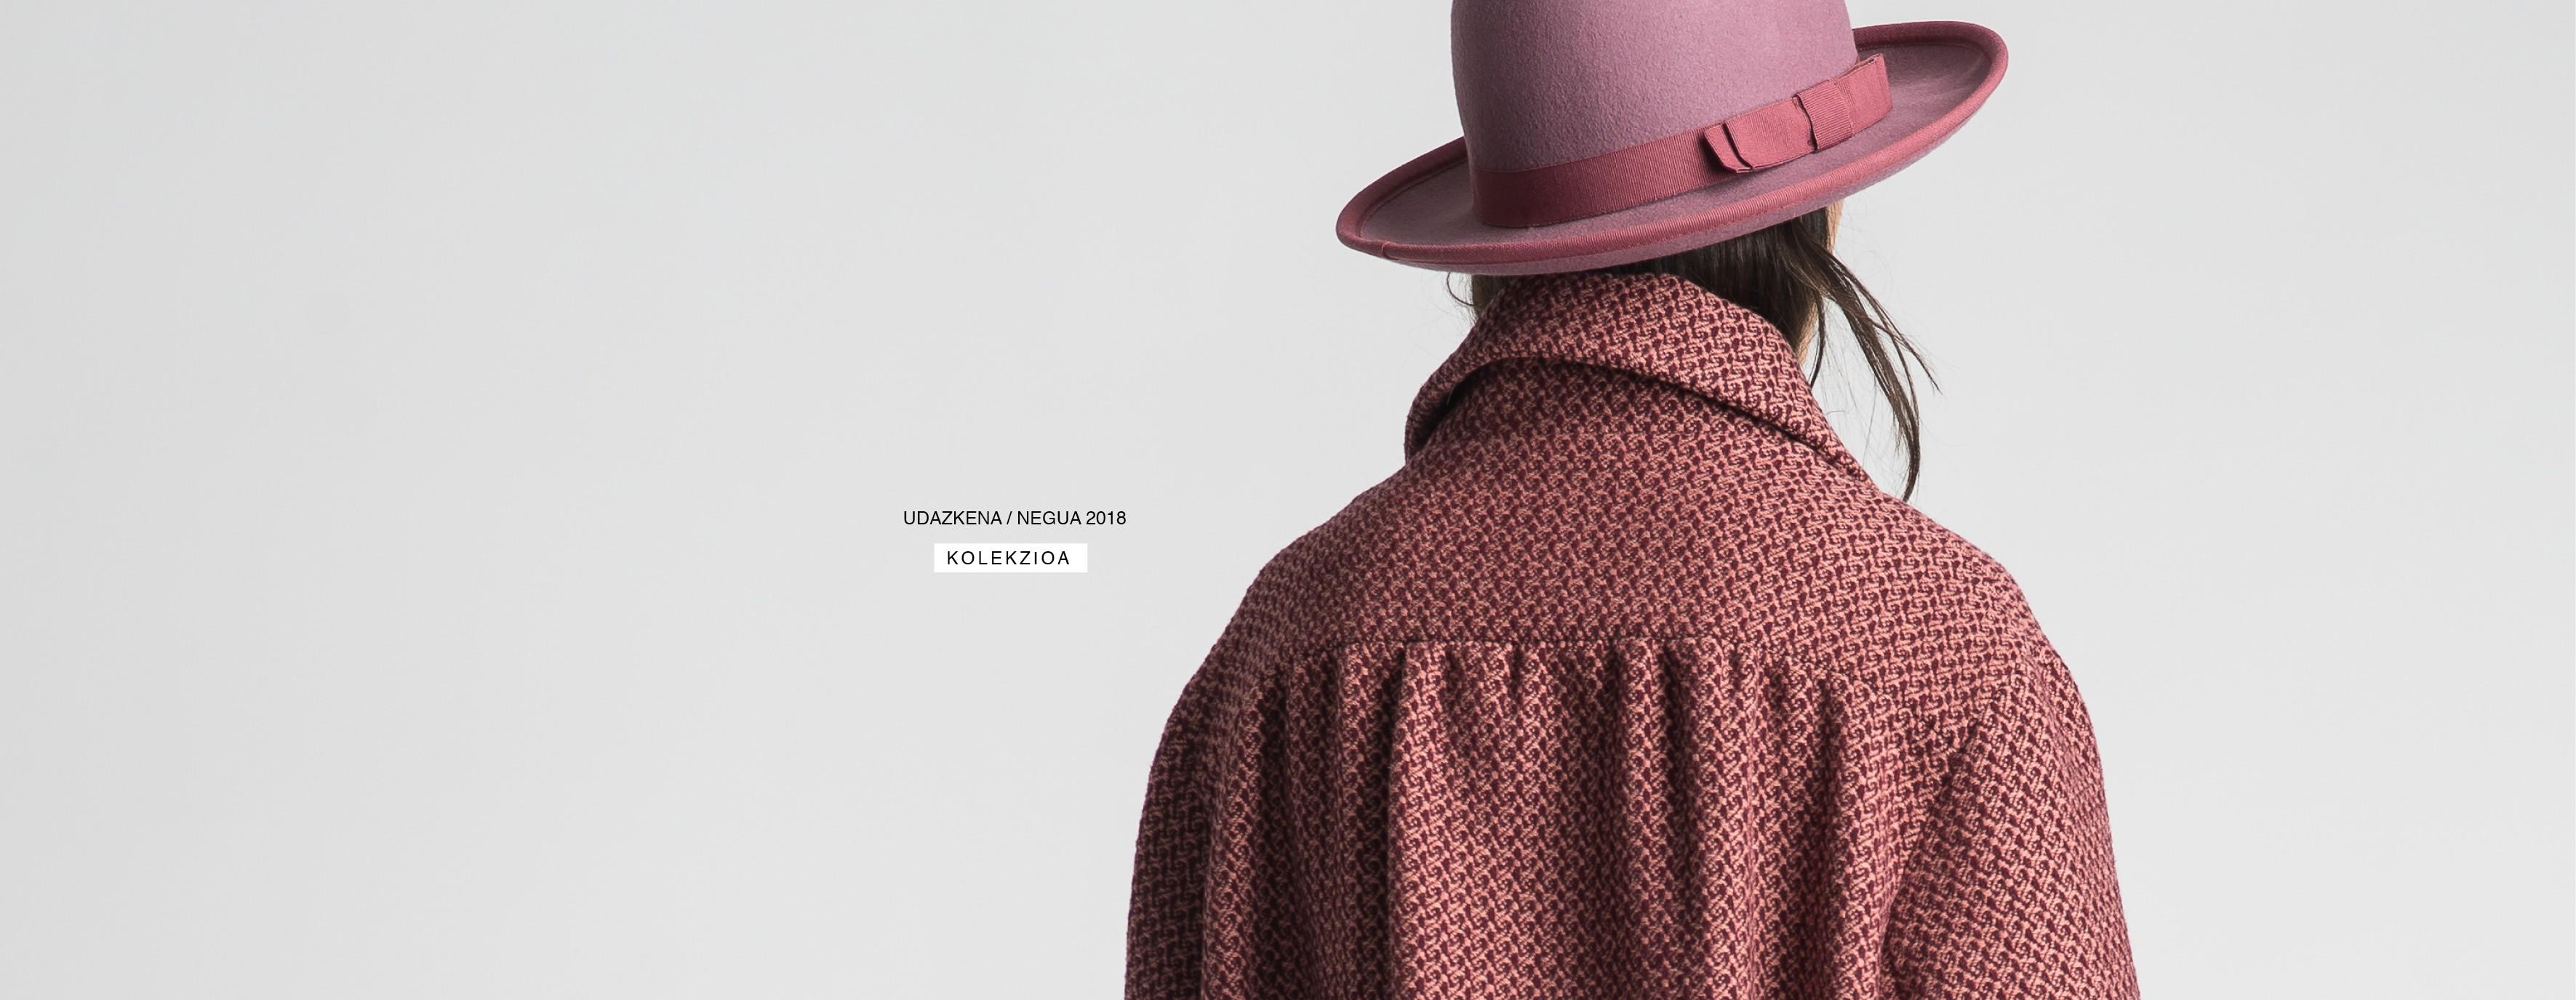 minimil-udazkena-negua-2018-kolekzioa